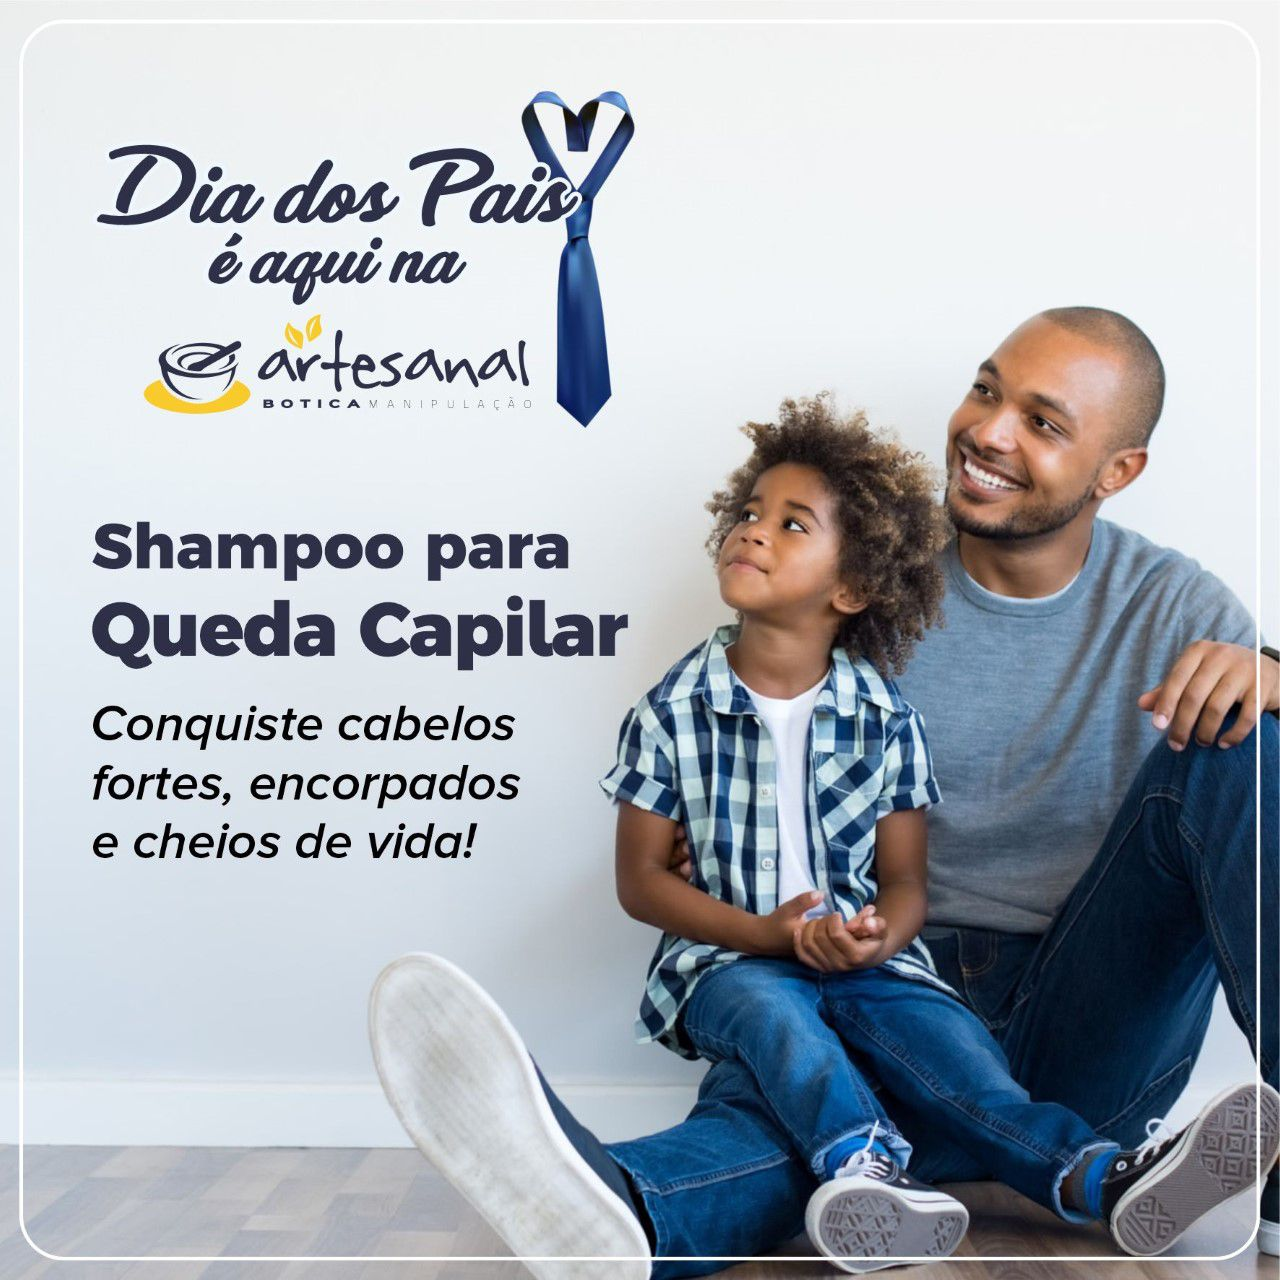 Shampoo Anti Queda 100ml - Artesanal Botica